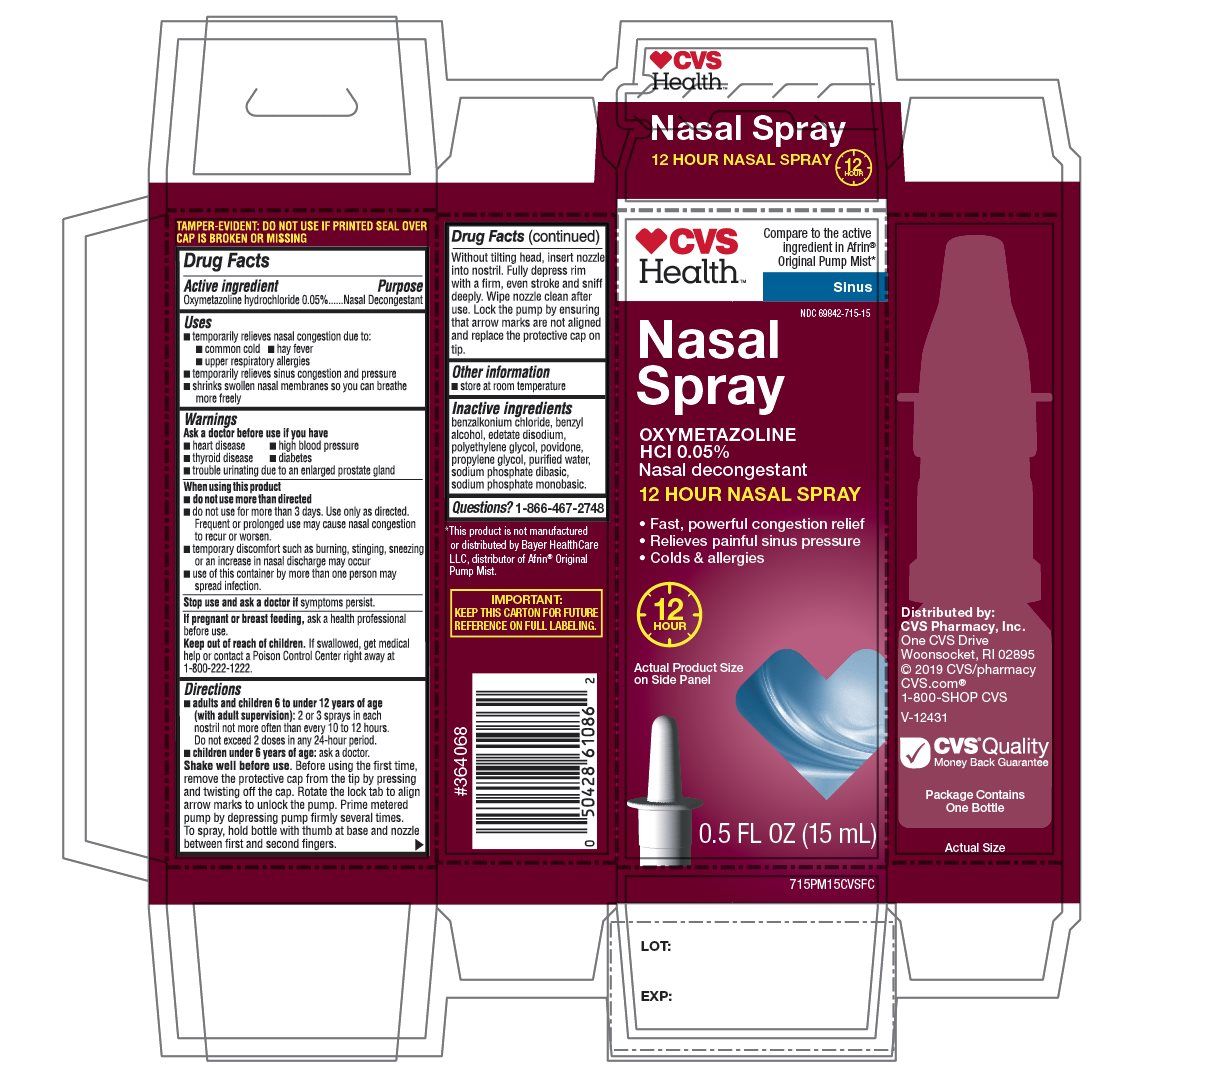 CVS Health Sinus Nasal Spray